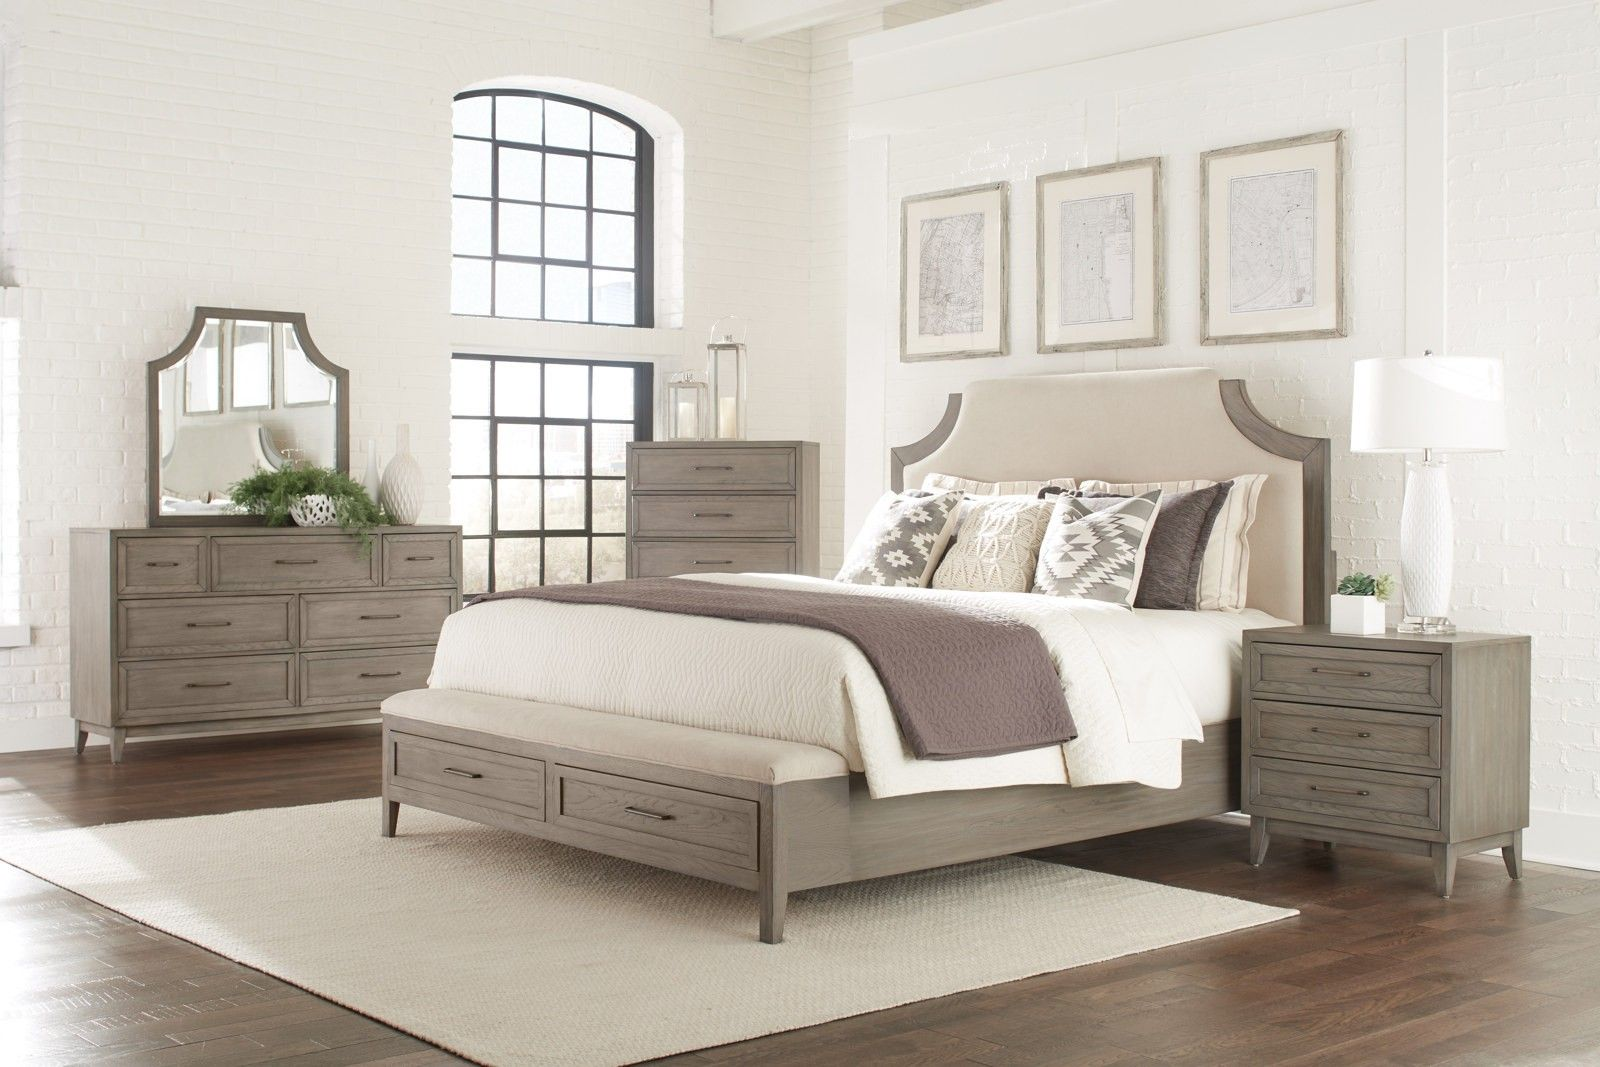 Riverside Furniture Vogue 4pc Panel Storage Bedroom Set in